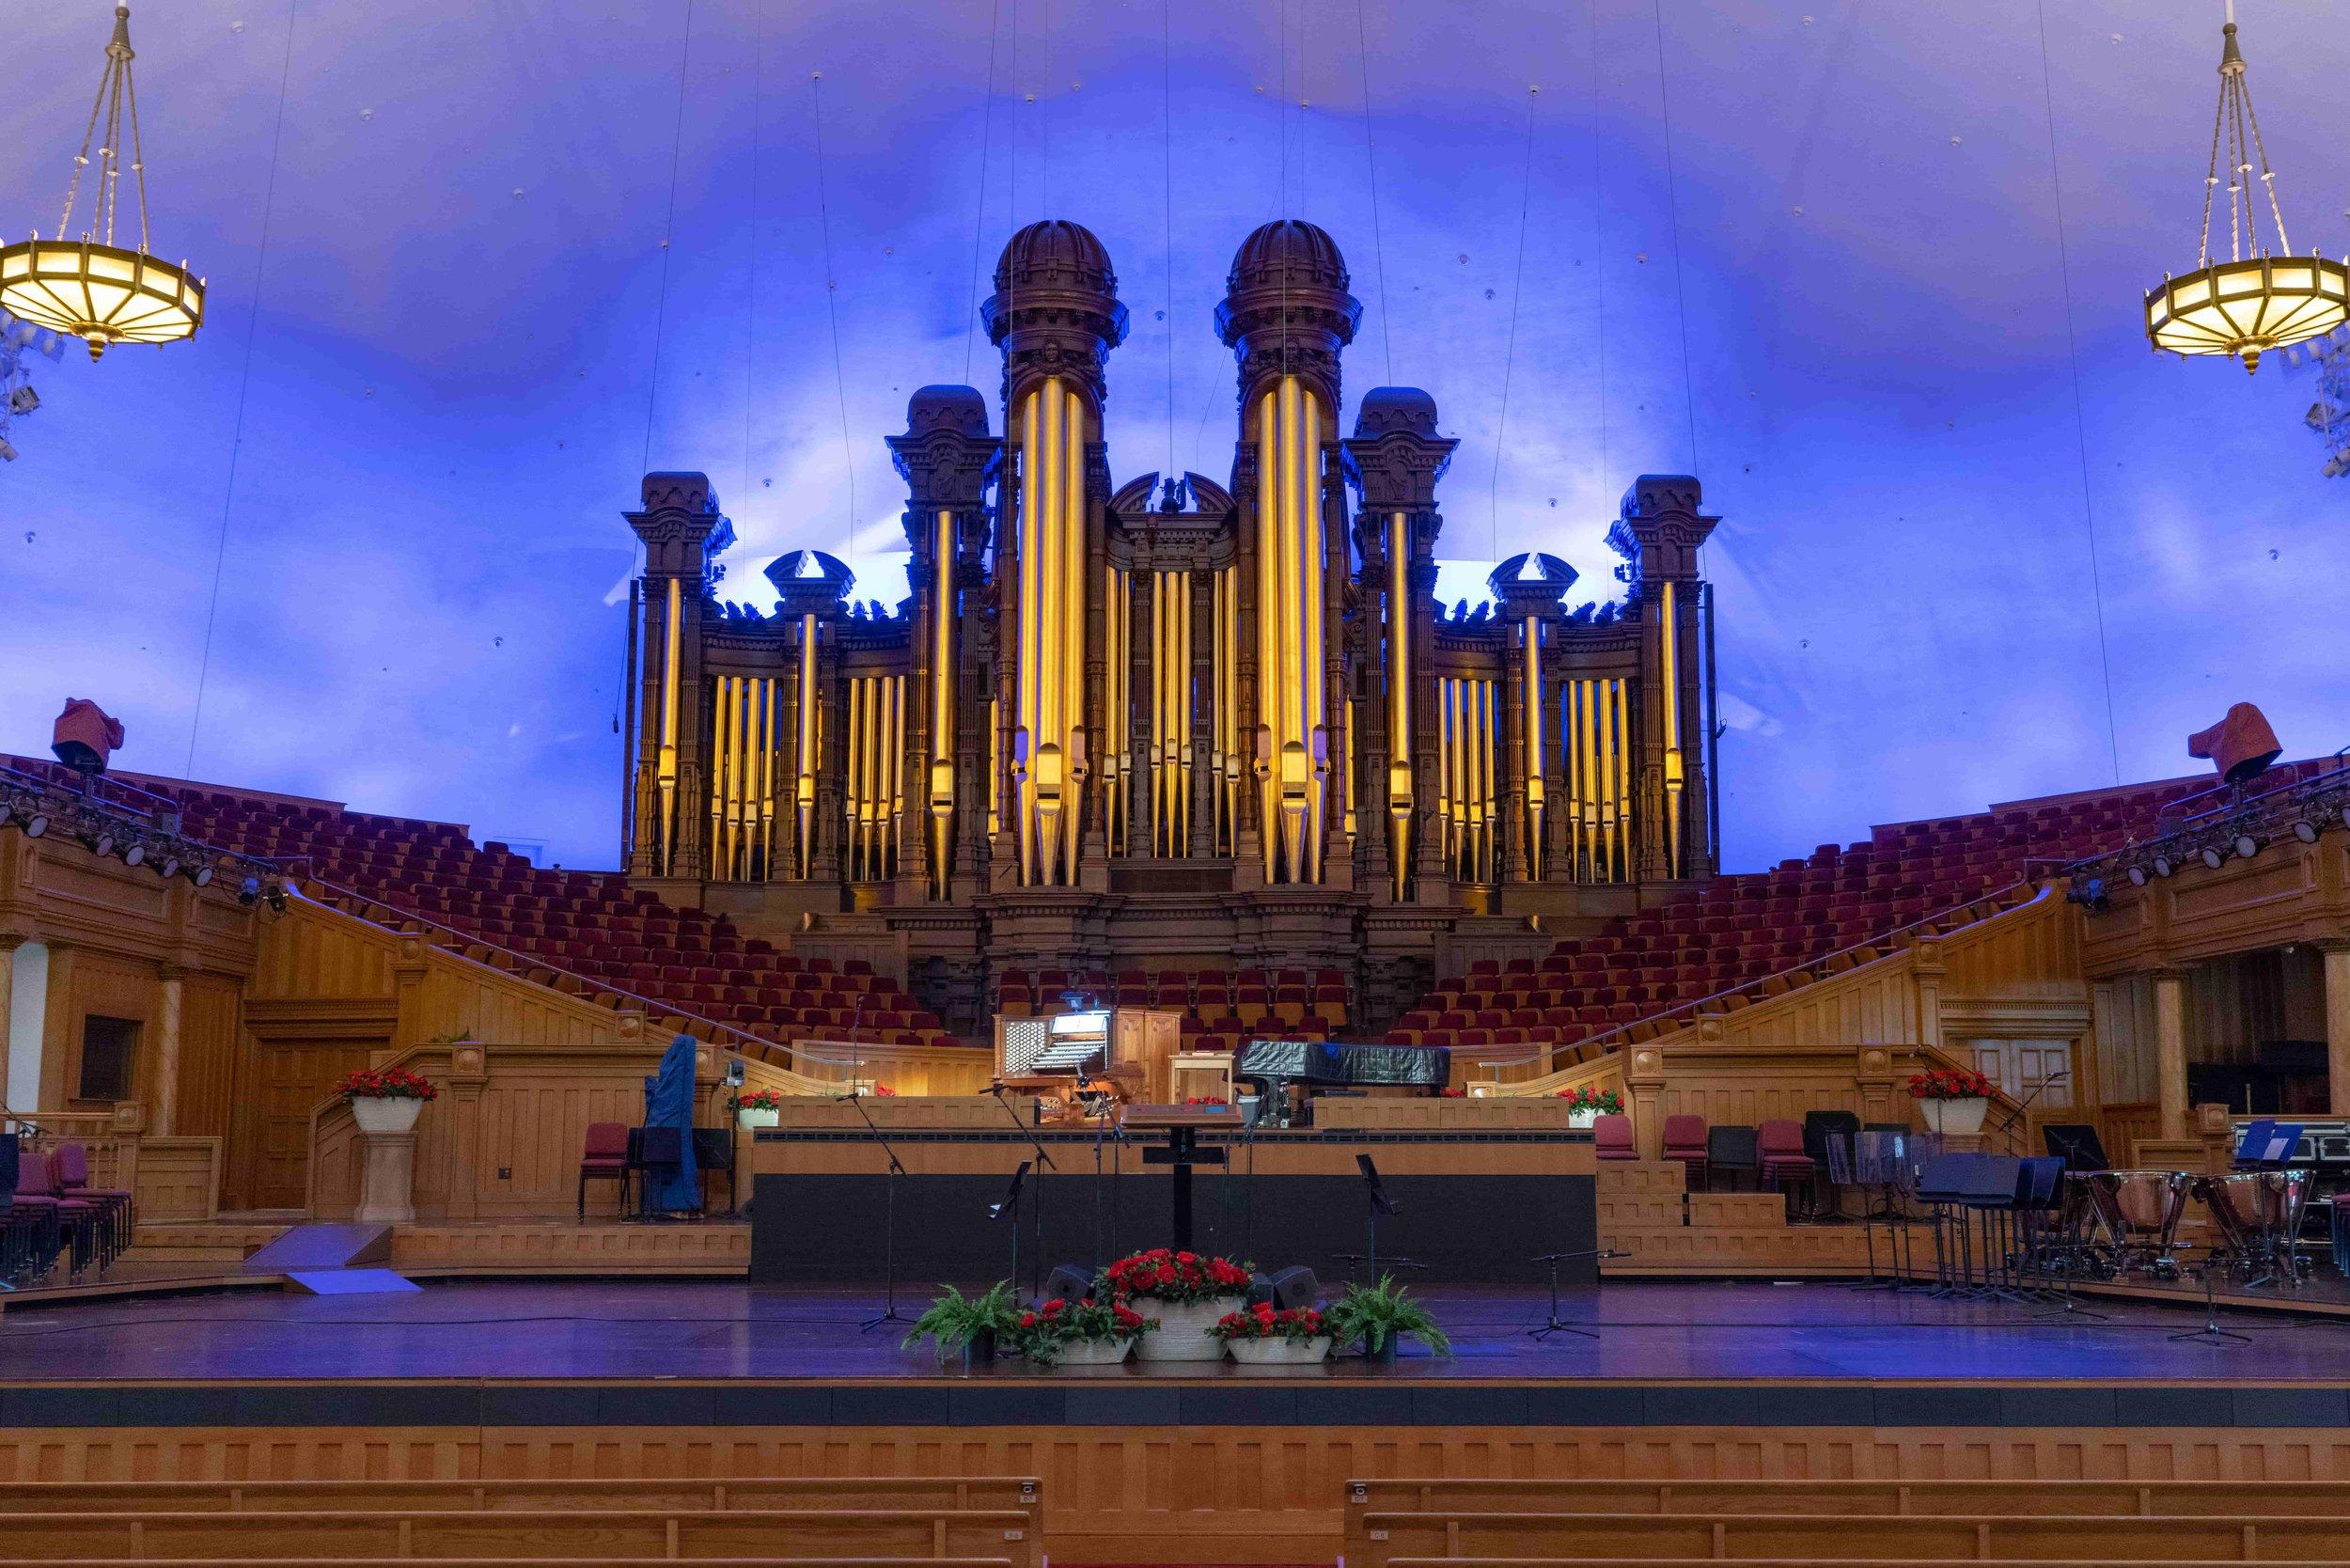 Salt Lake Tabernacle pipe organ has 11,623 pipes!